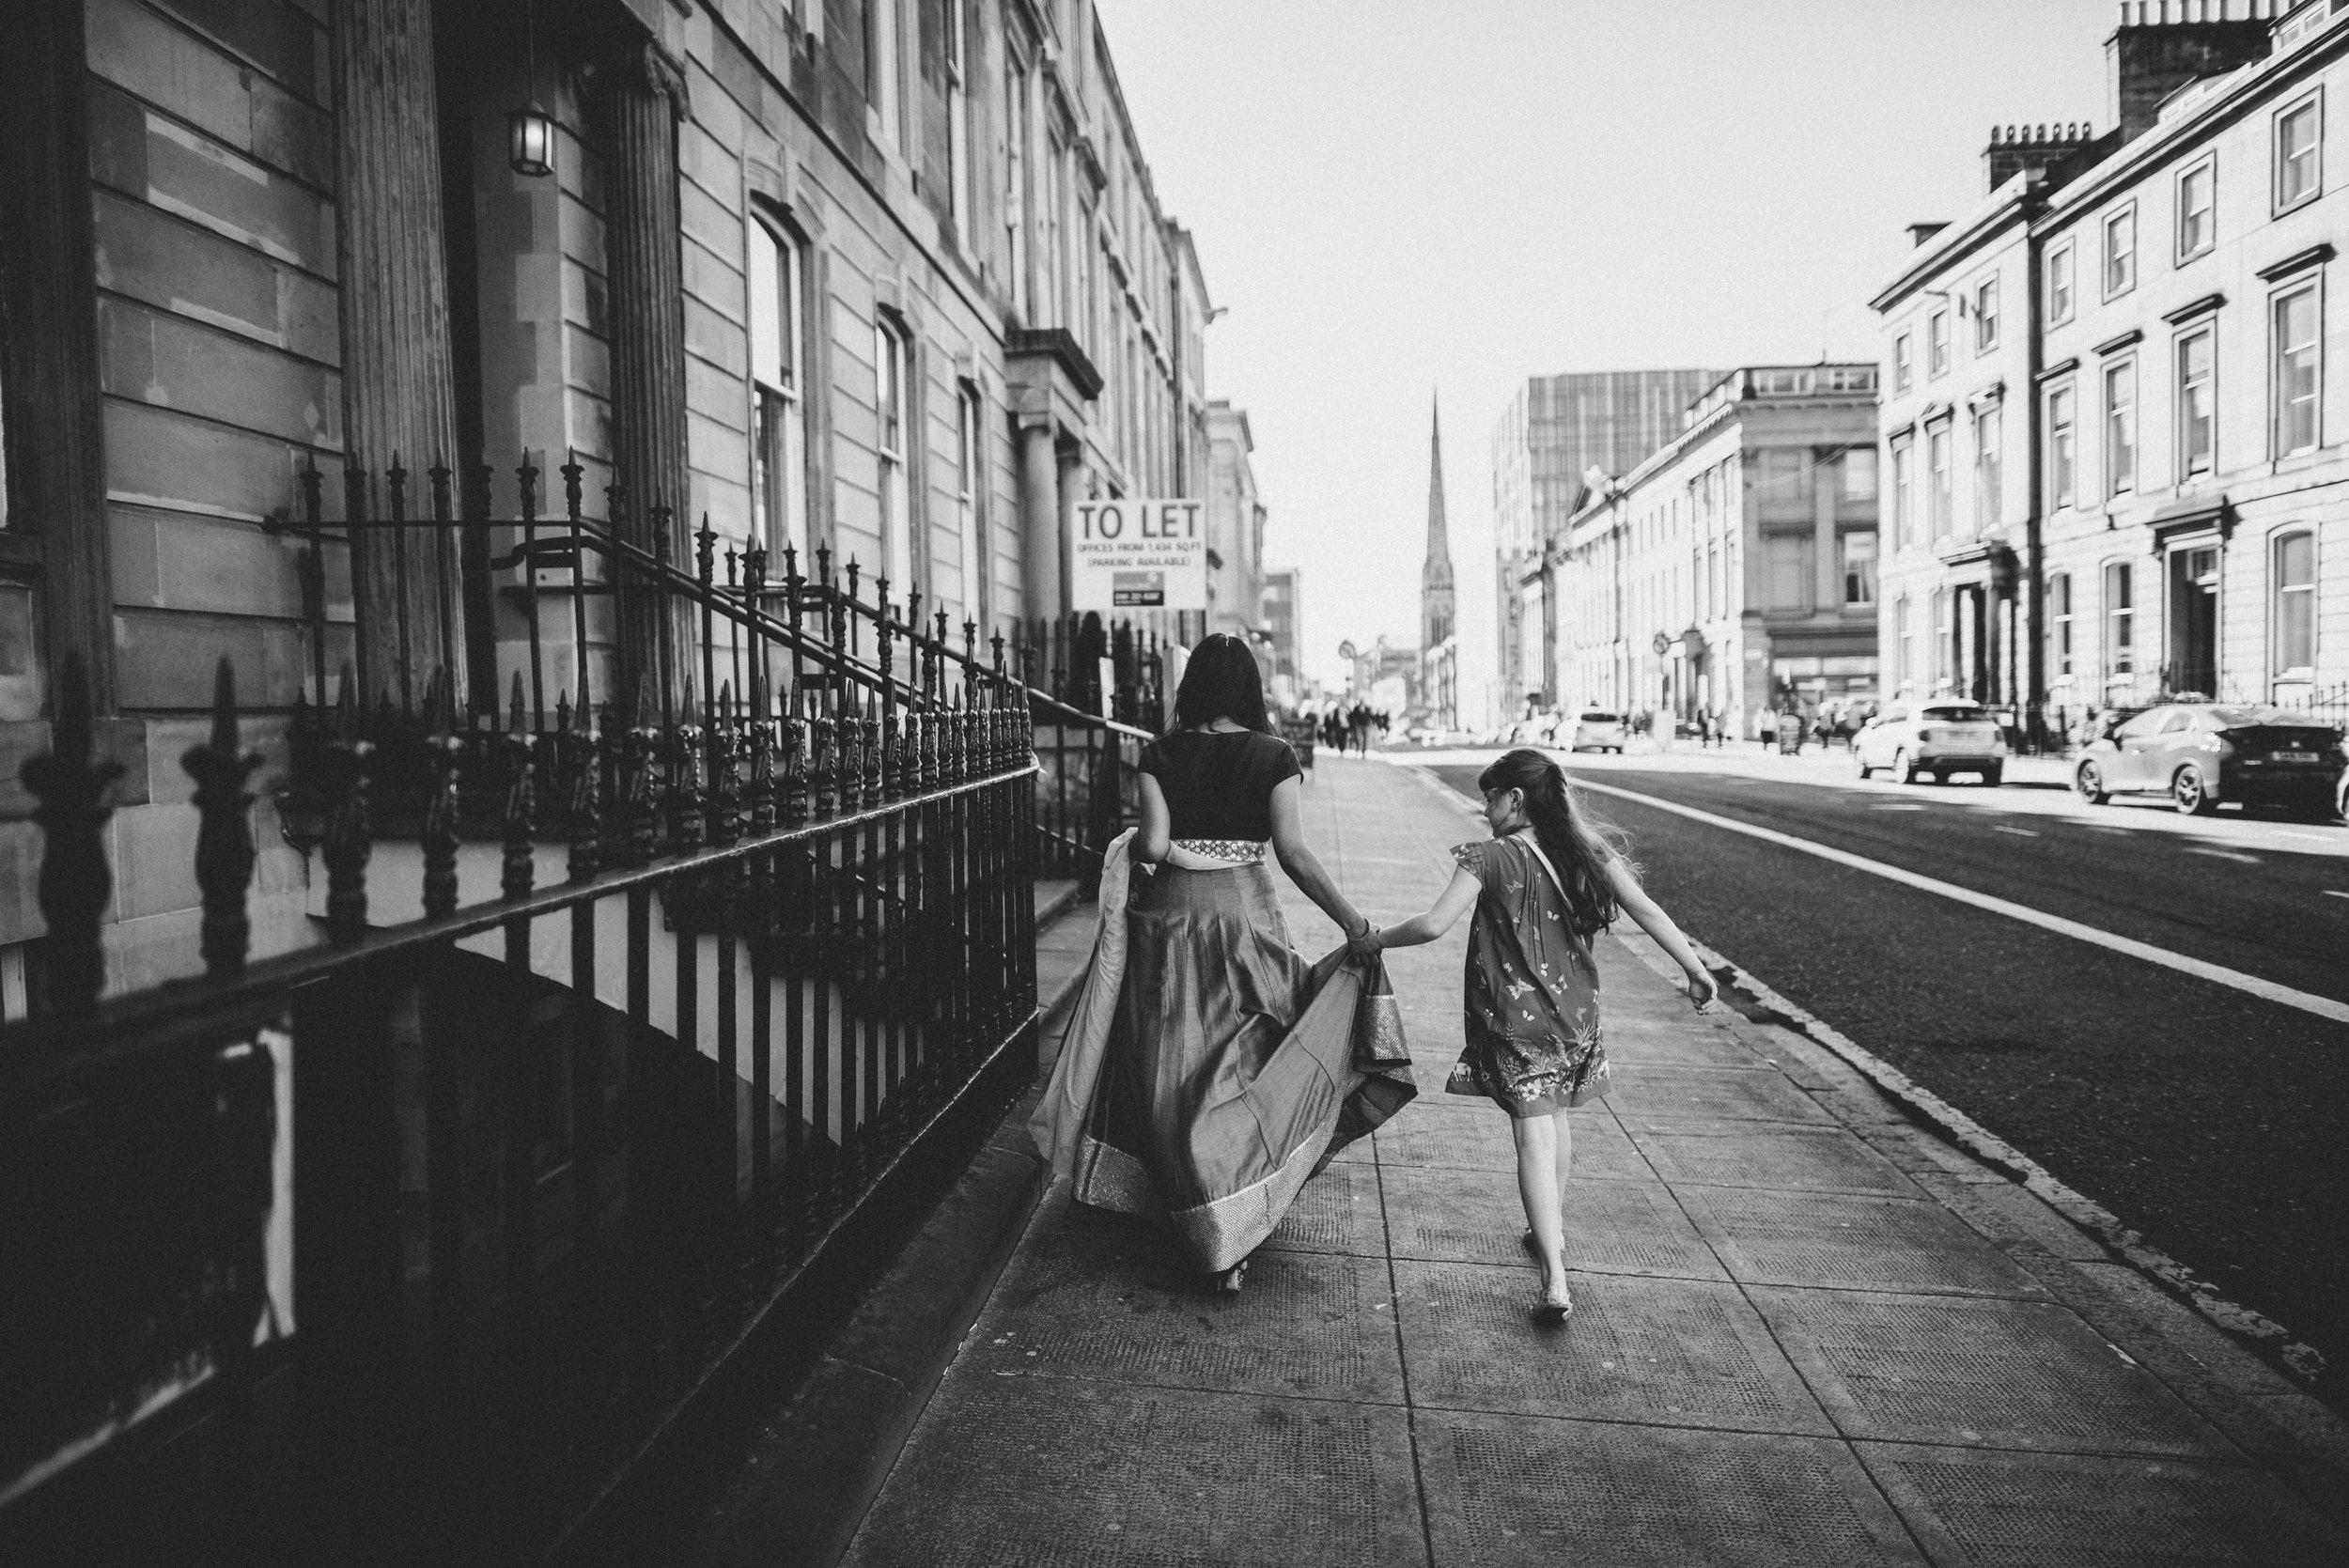 0174-LISA-DEVINE-PHOTOGRAPHY-ALTERNATIVE-WEDDING-PHOTOGRAPHY-SCOTLAND-DESTINATION-WEDDINGS-GLASGOW-WEDDINGS-COOL-WEDDINGS-STYLISH-WEDDINGS.JPG